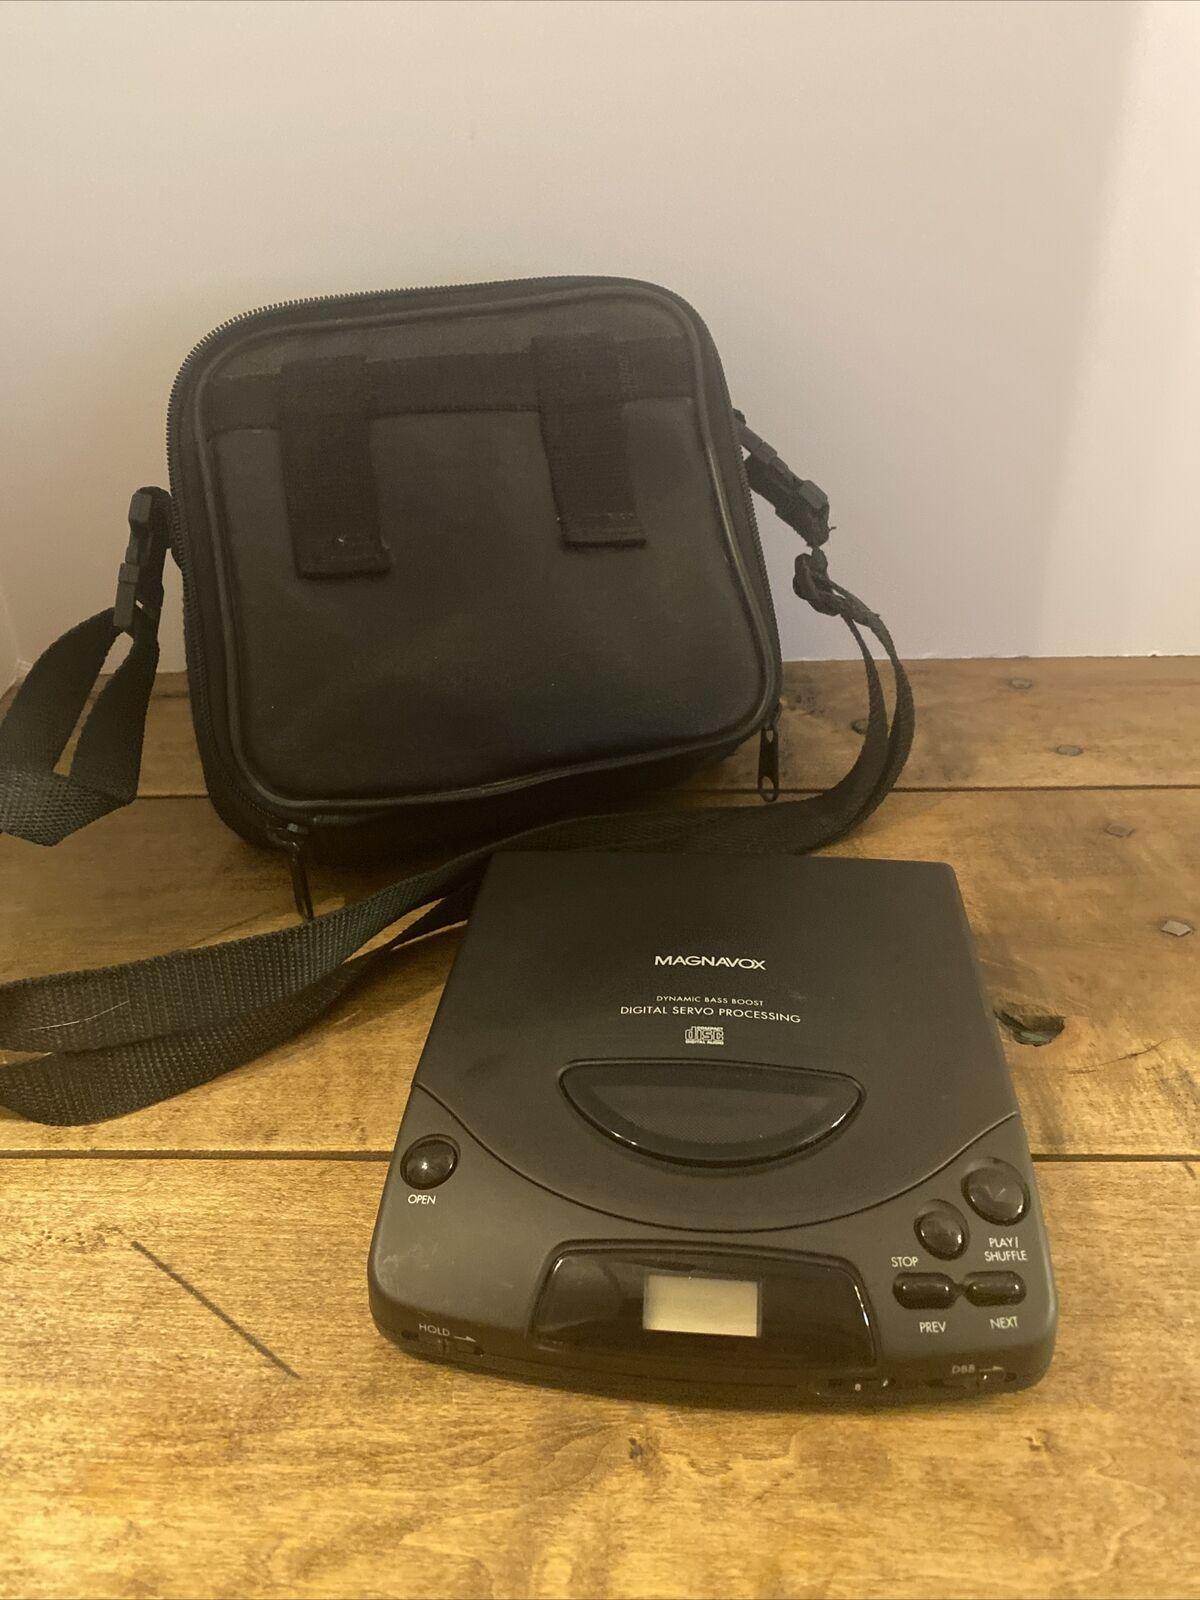 VTG 1994 Magnavox Personal Portable CD Player Dynamic Bass Boost AZ6839 Works